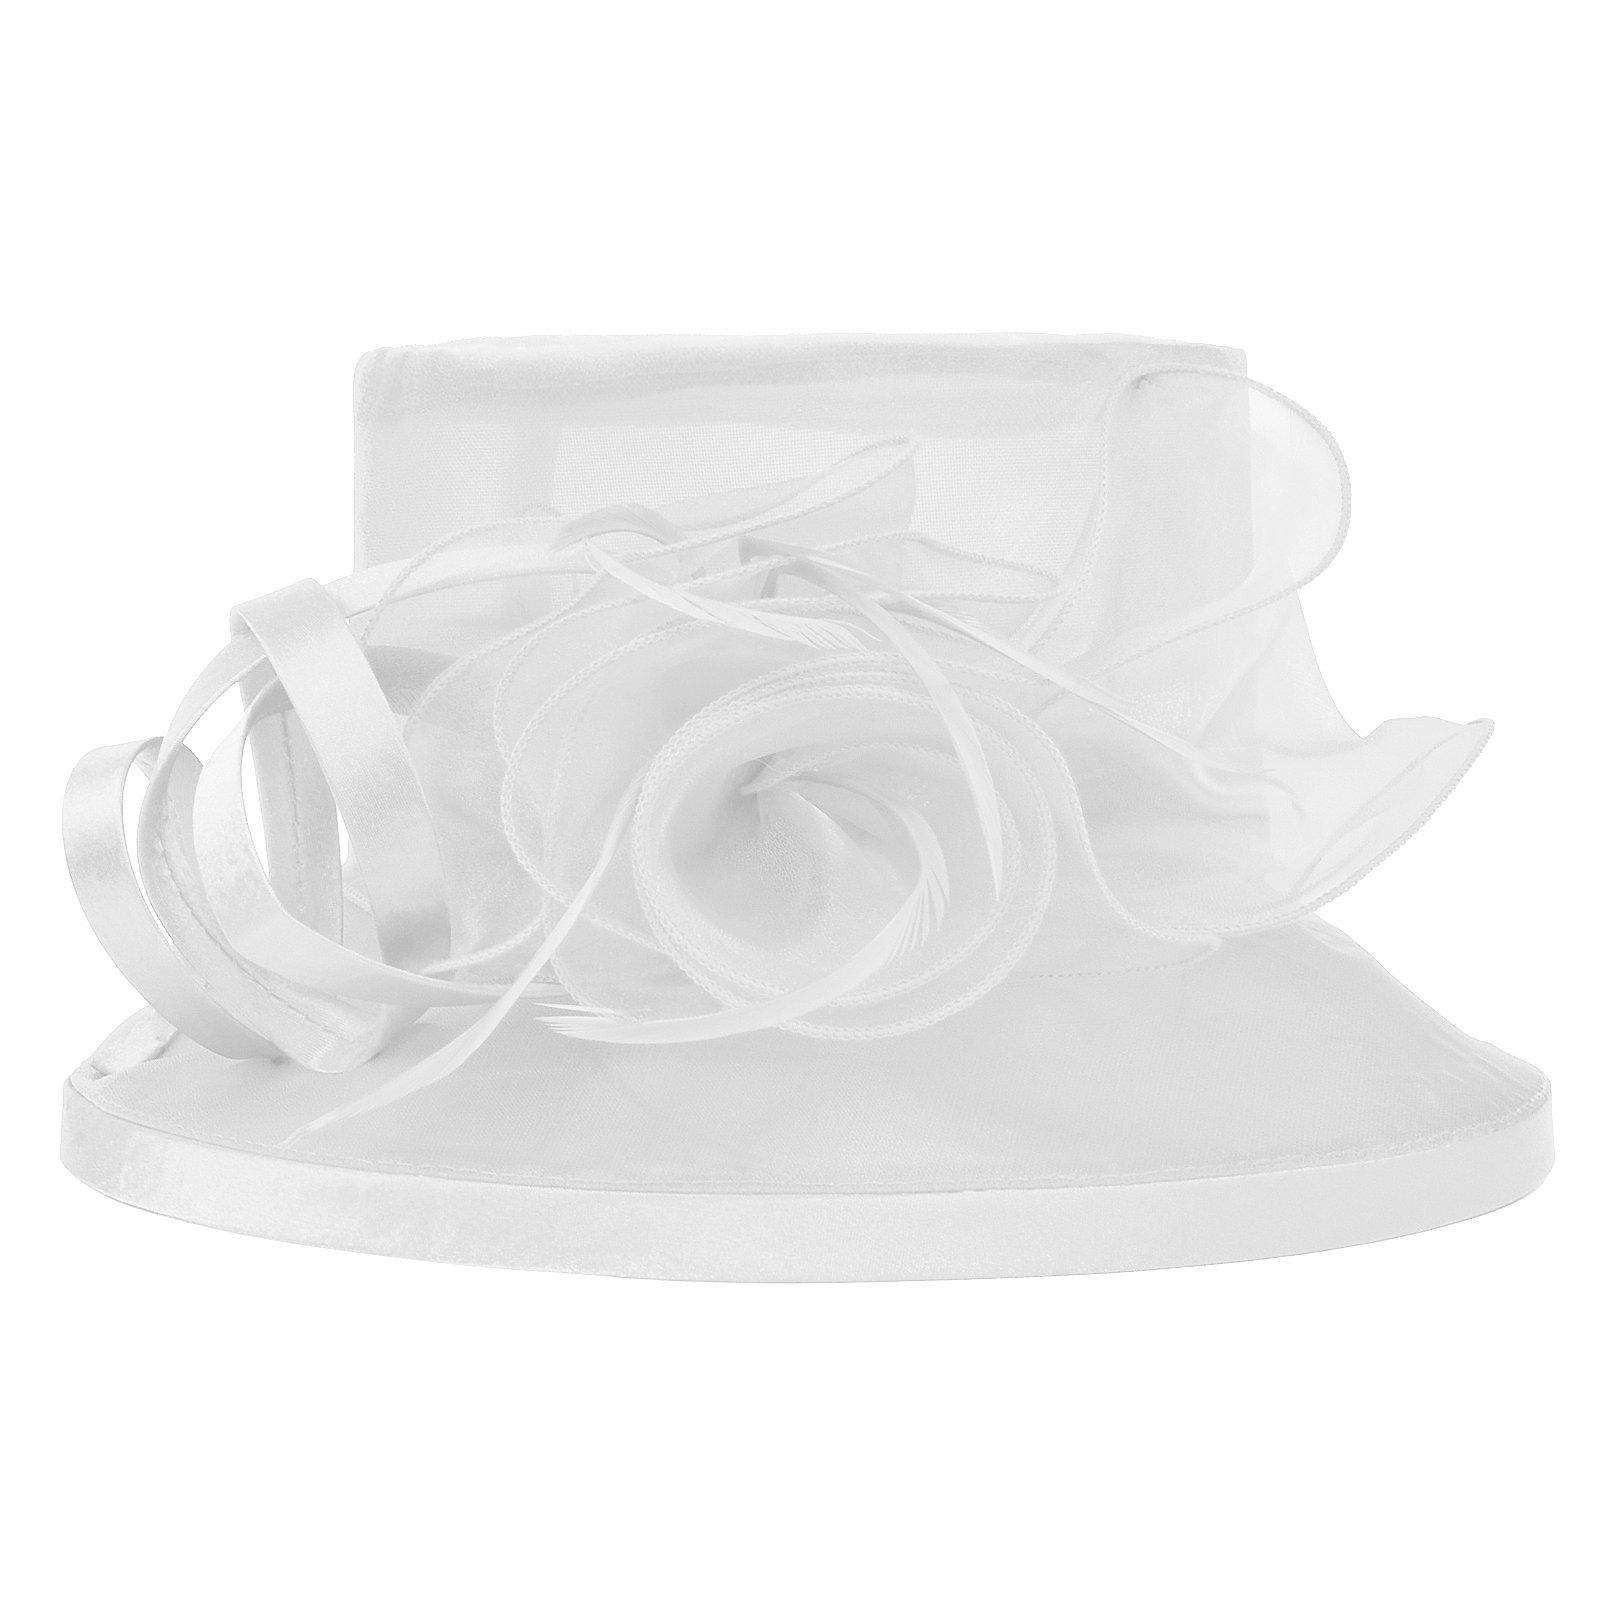 Original One Women's Kentucky Derby Tea Part Dress Church Fascinators Fancy Hats (White) M by Original One (Image #4)